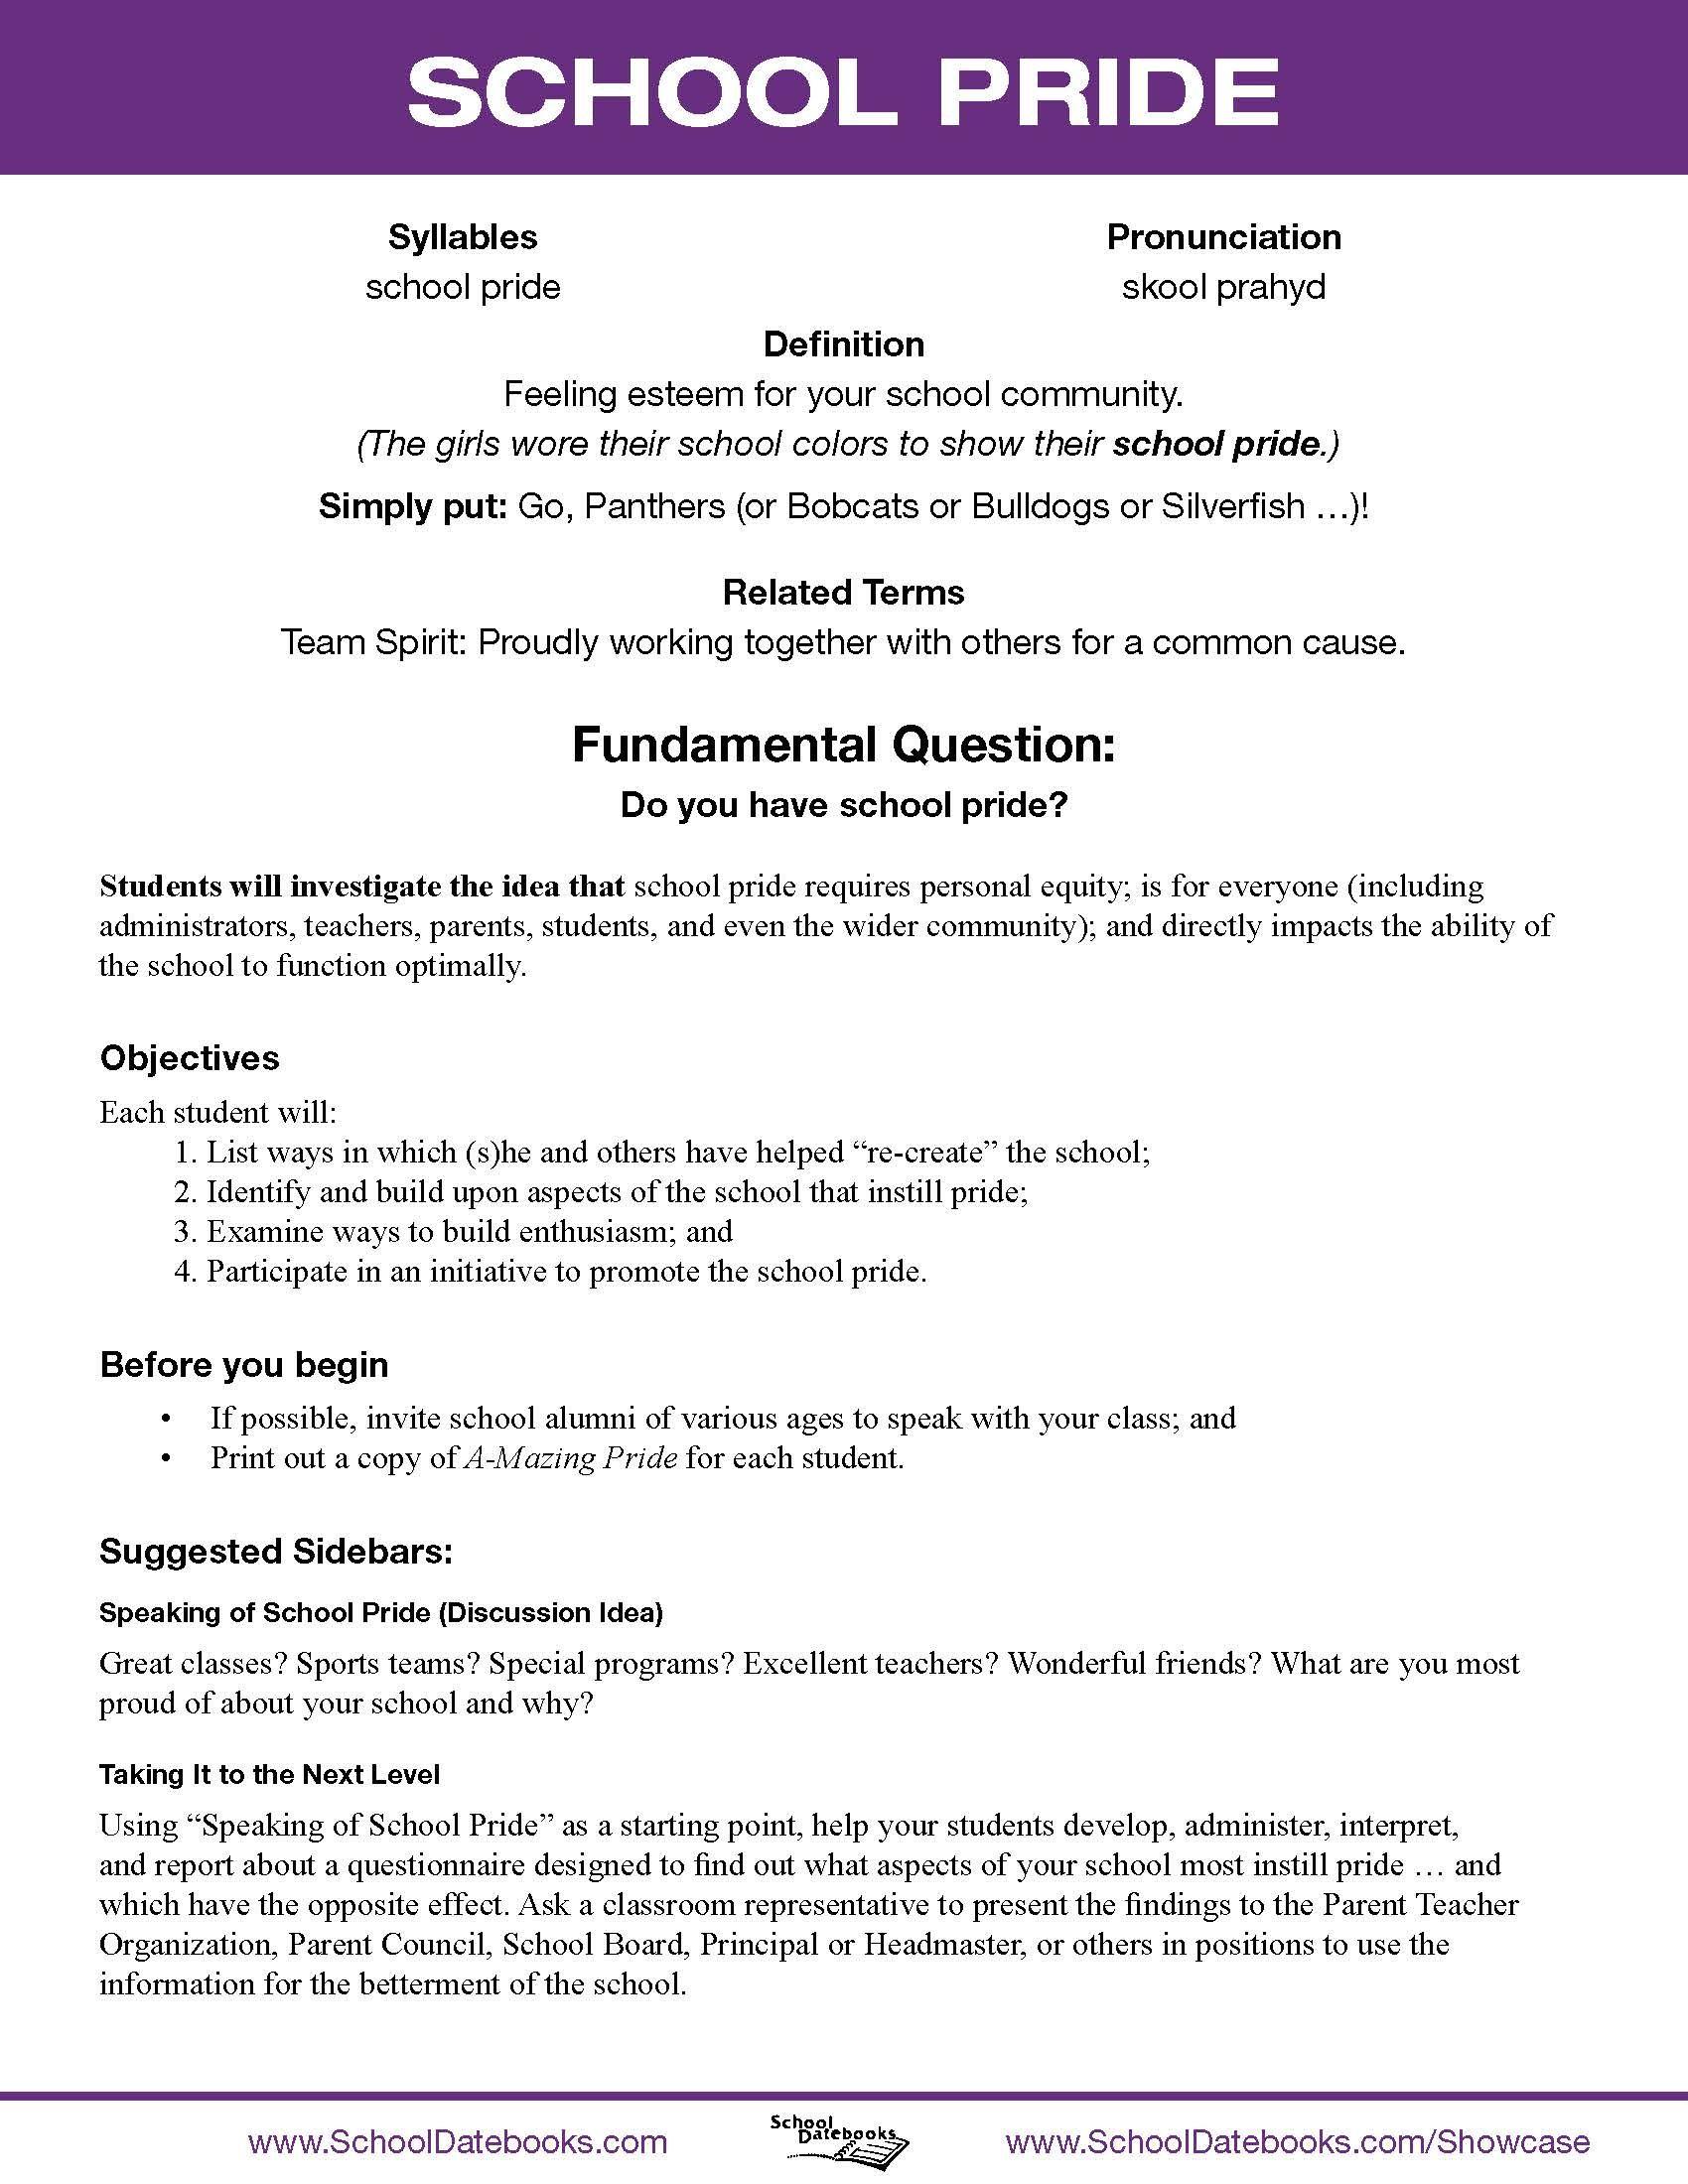 School Pride - Character Lesson Plan. Free [ 2200 x 1700 Pixel ]